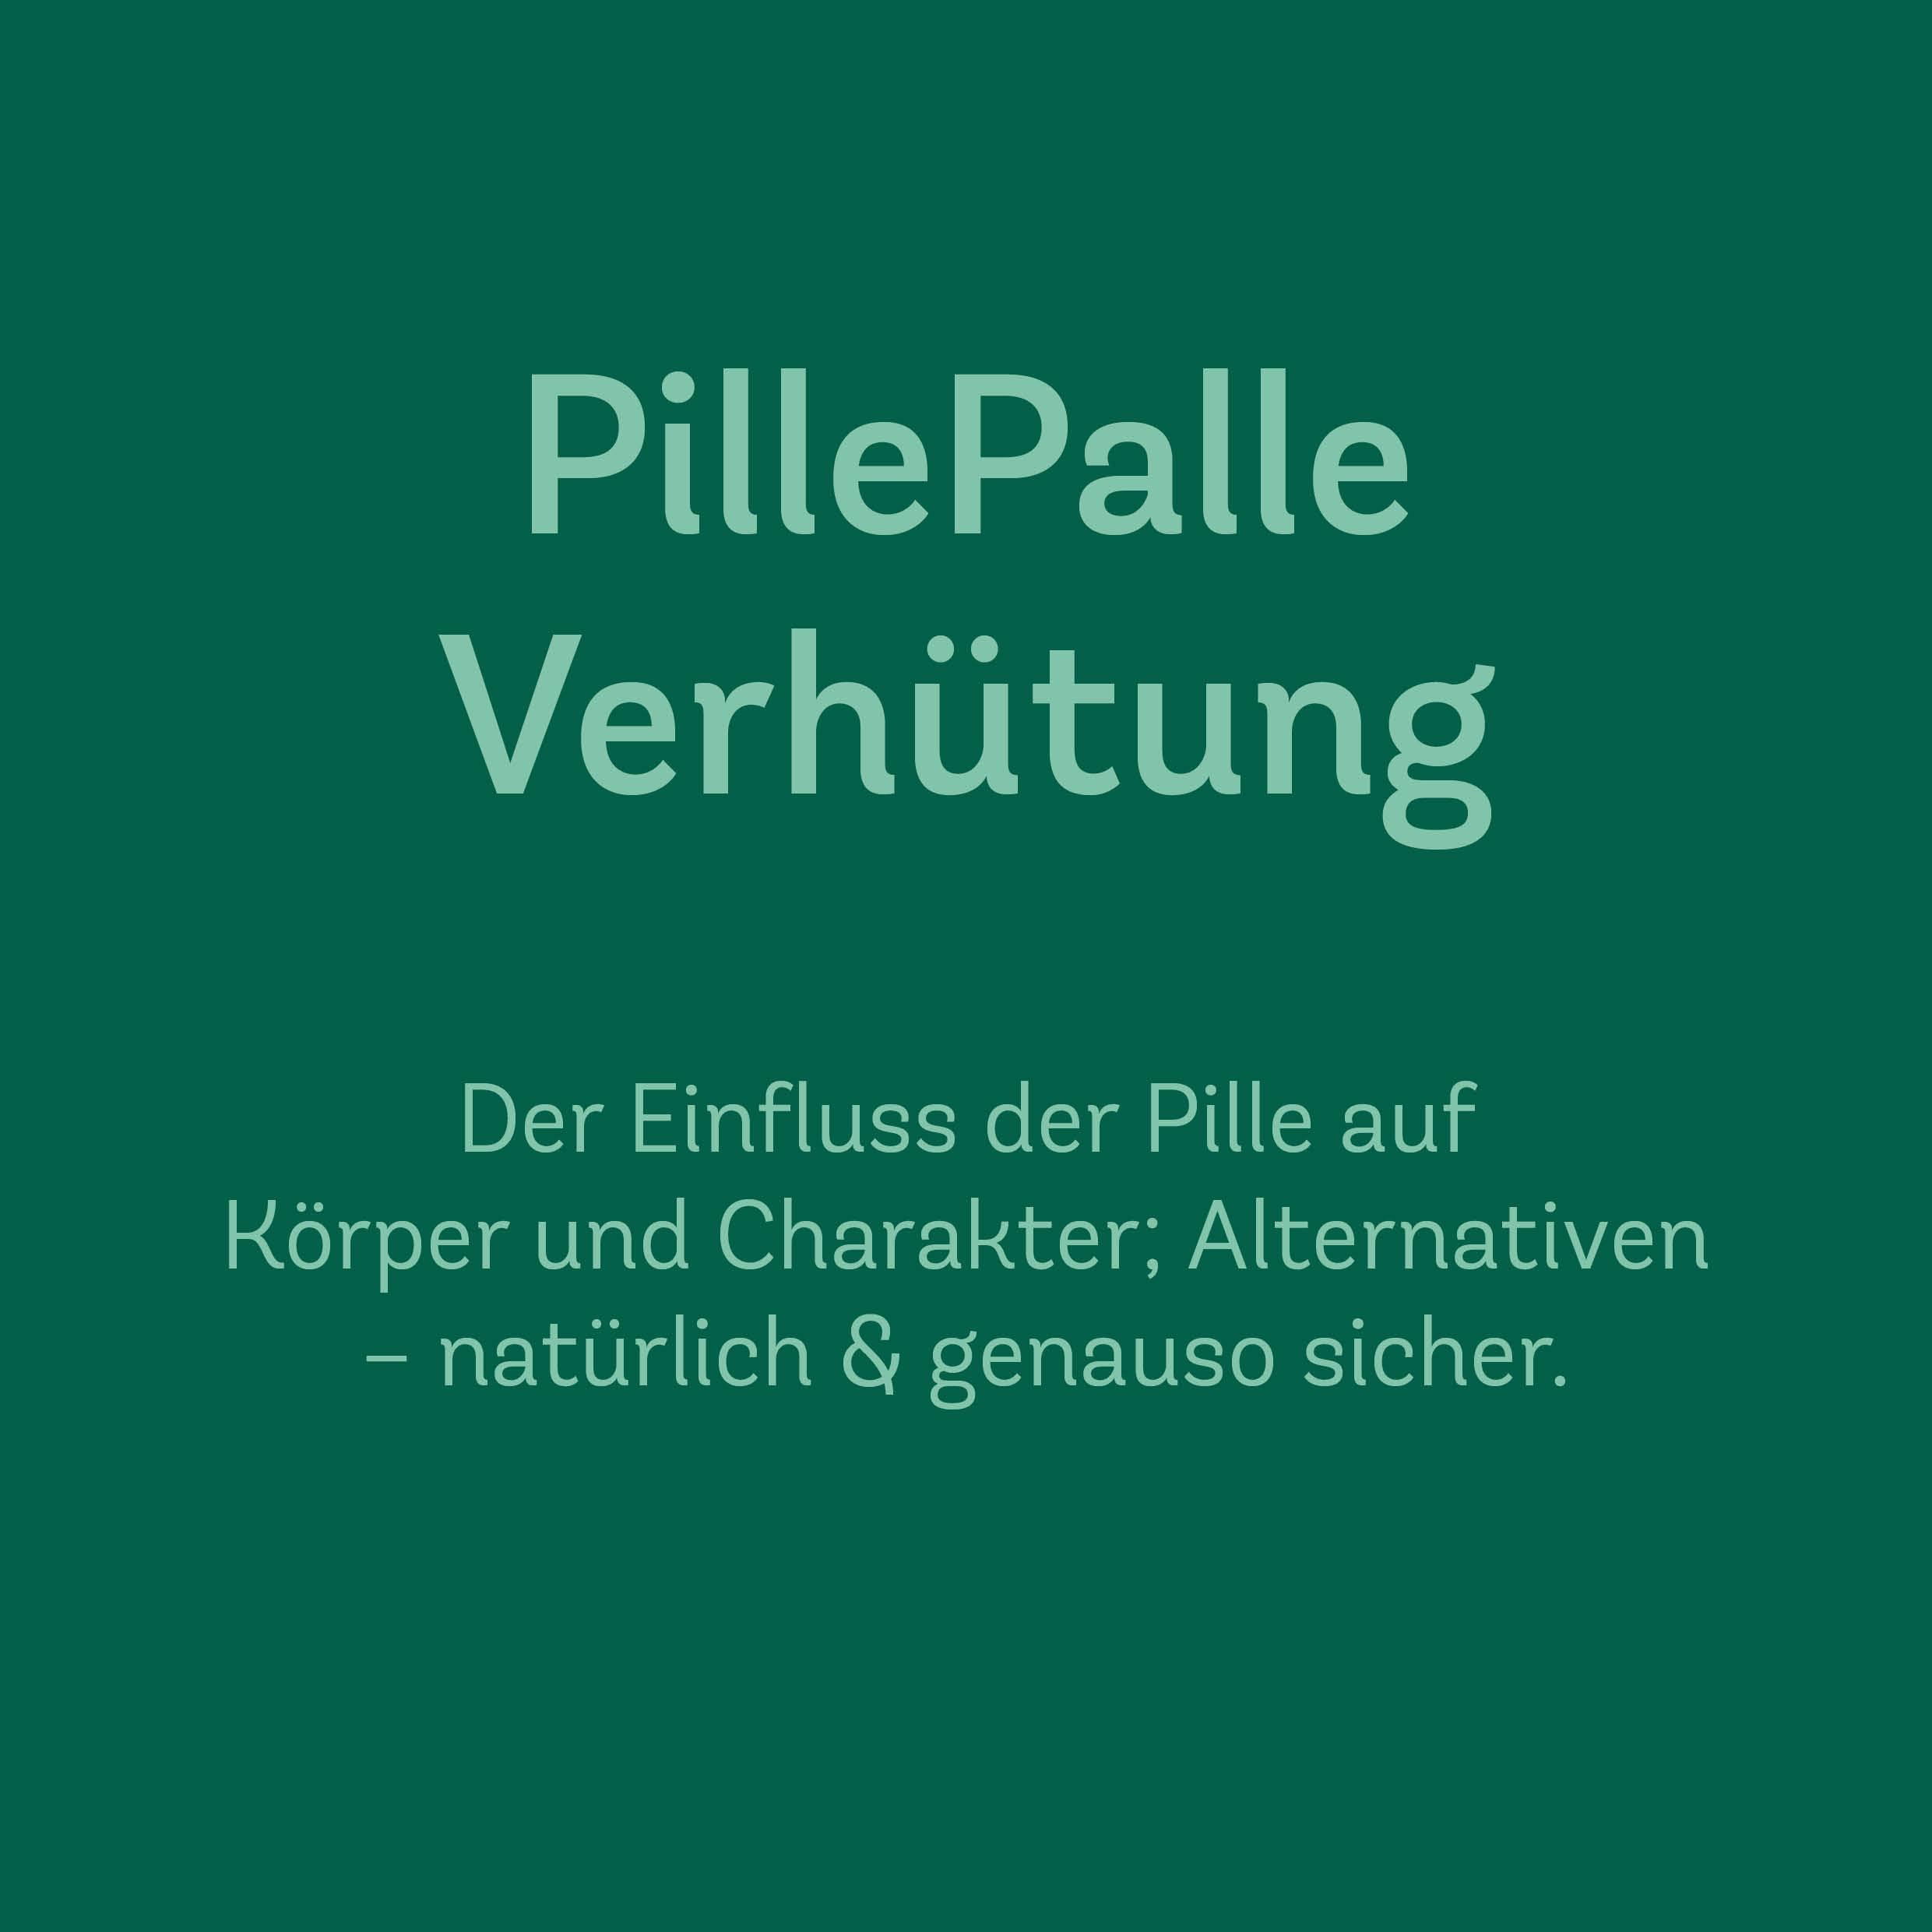 PillePalle Verhütung – Onlinekurs